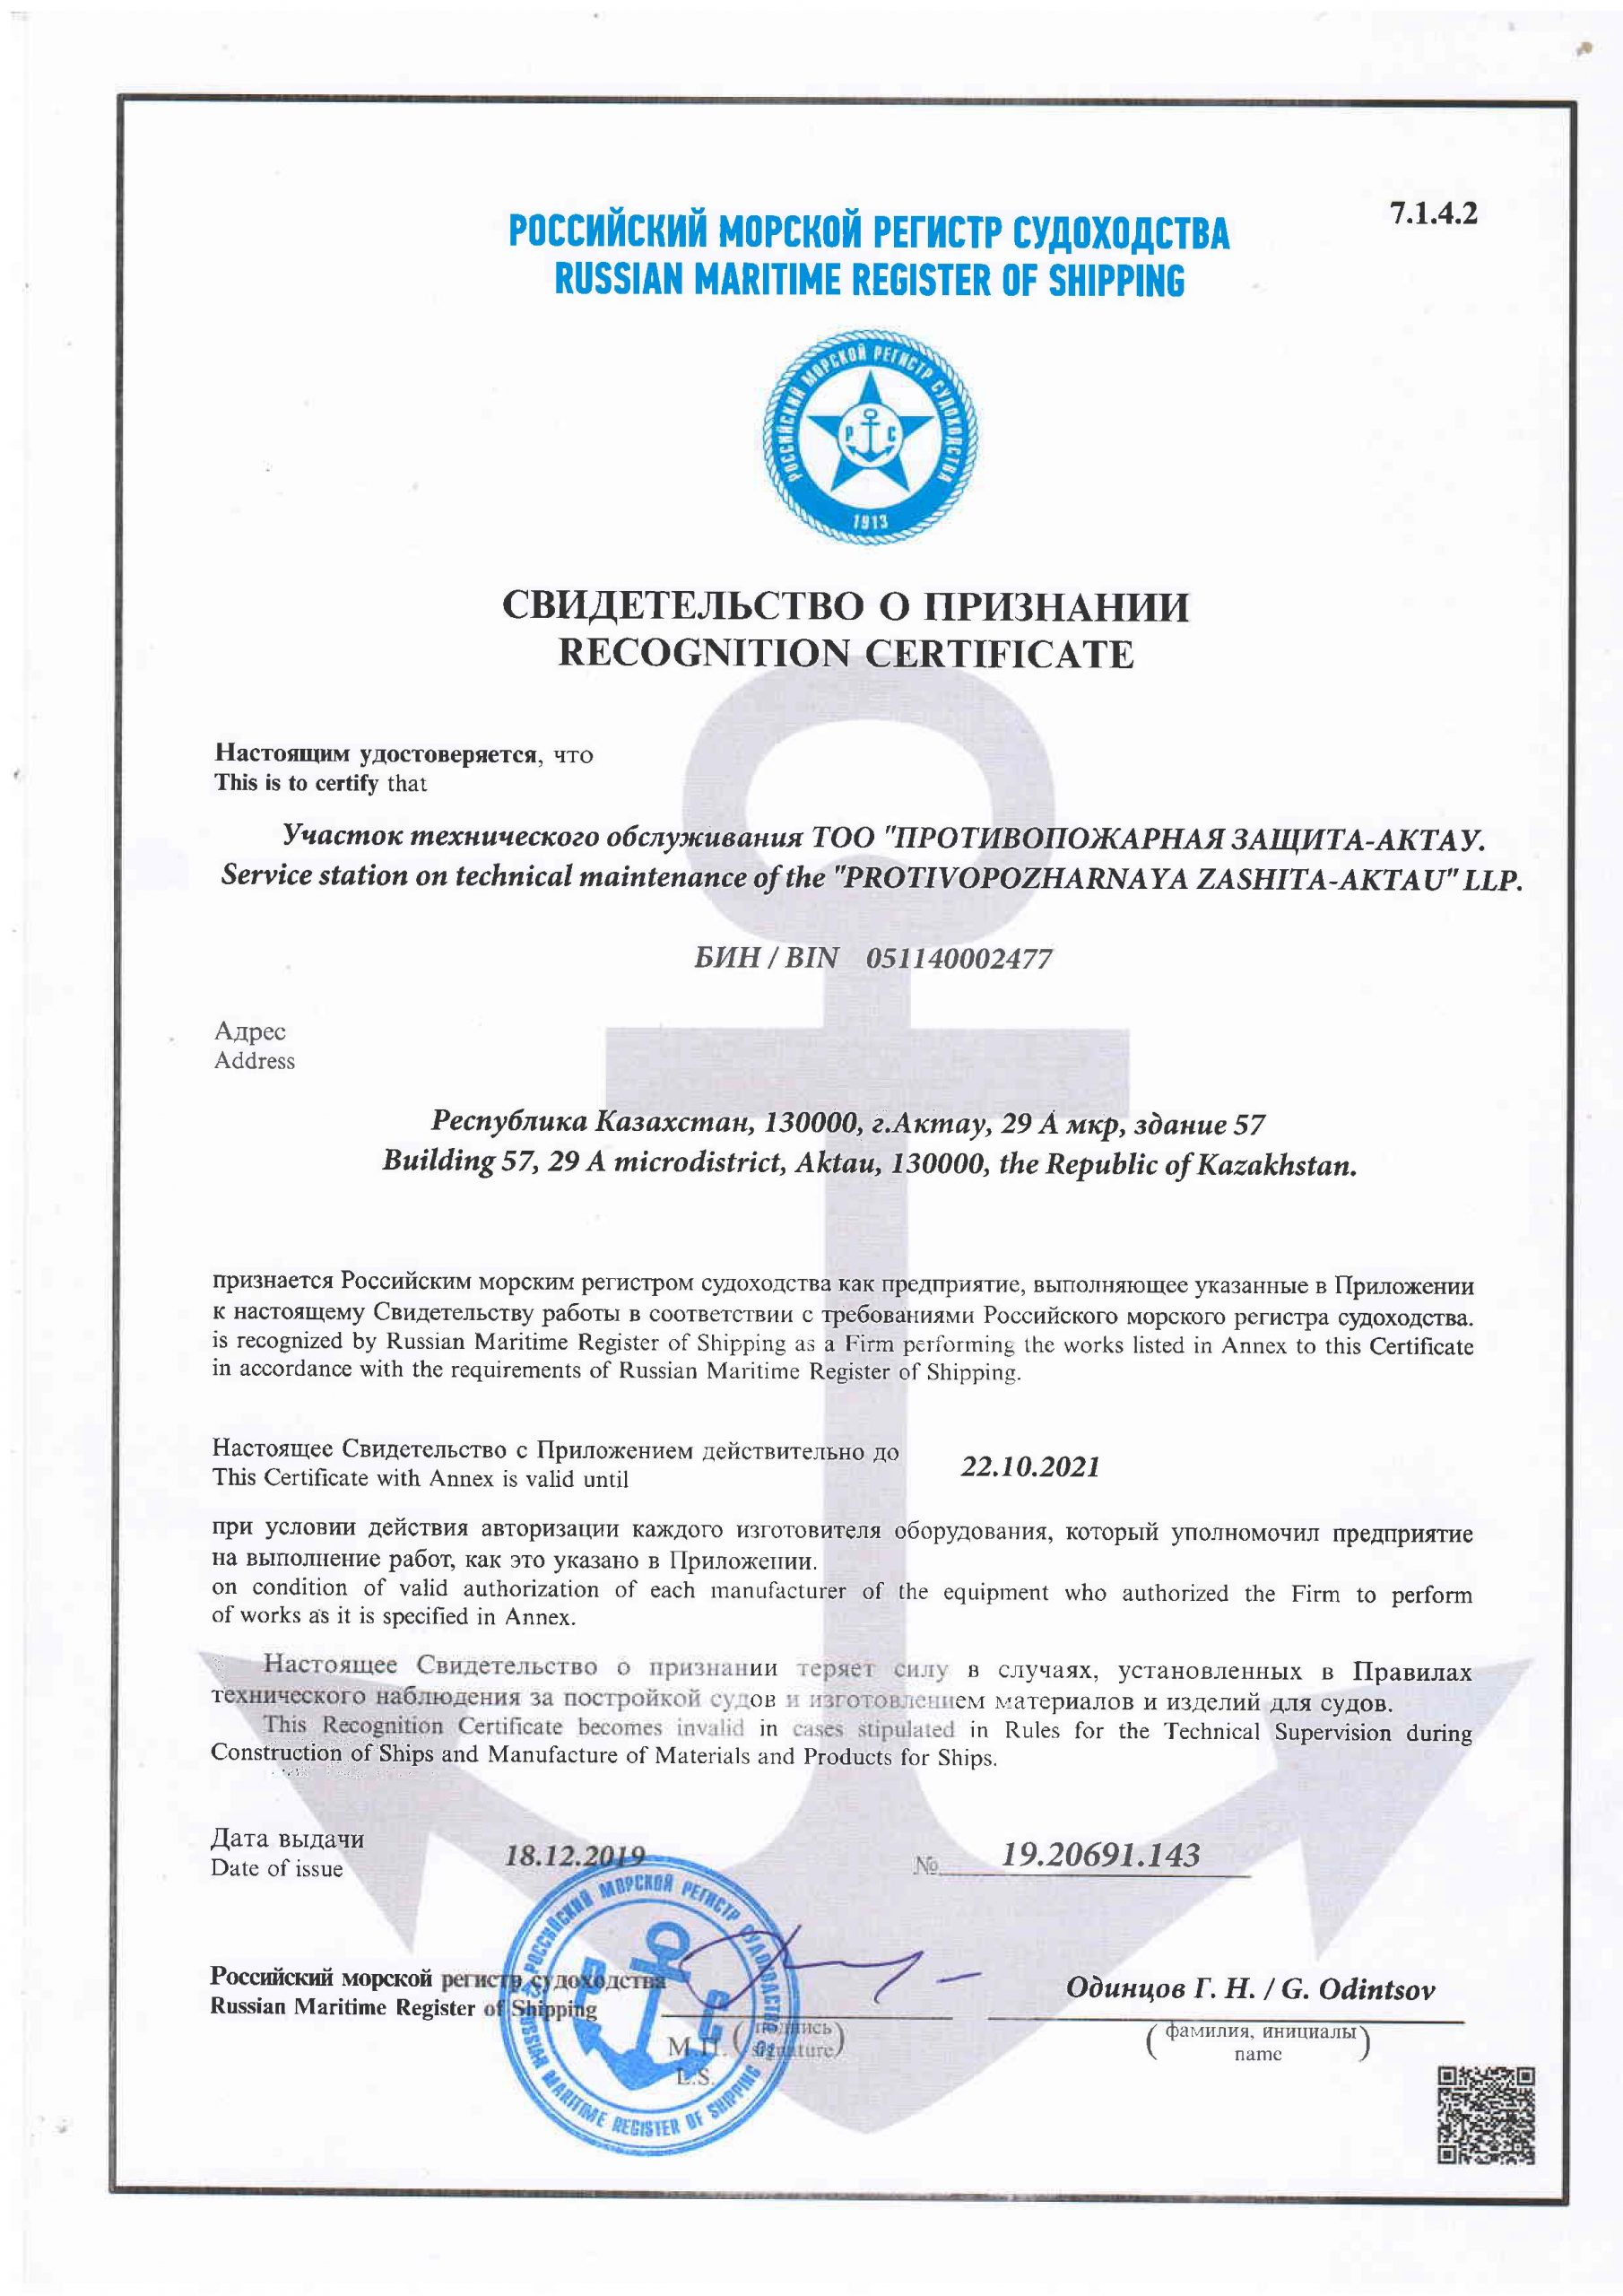 Свид. о признании ССЗС, МНУ до 22.10.21